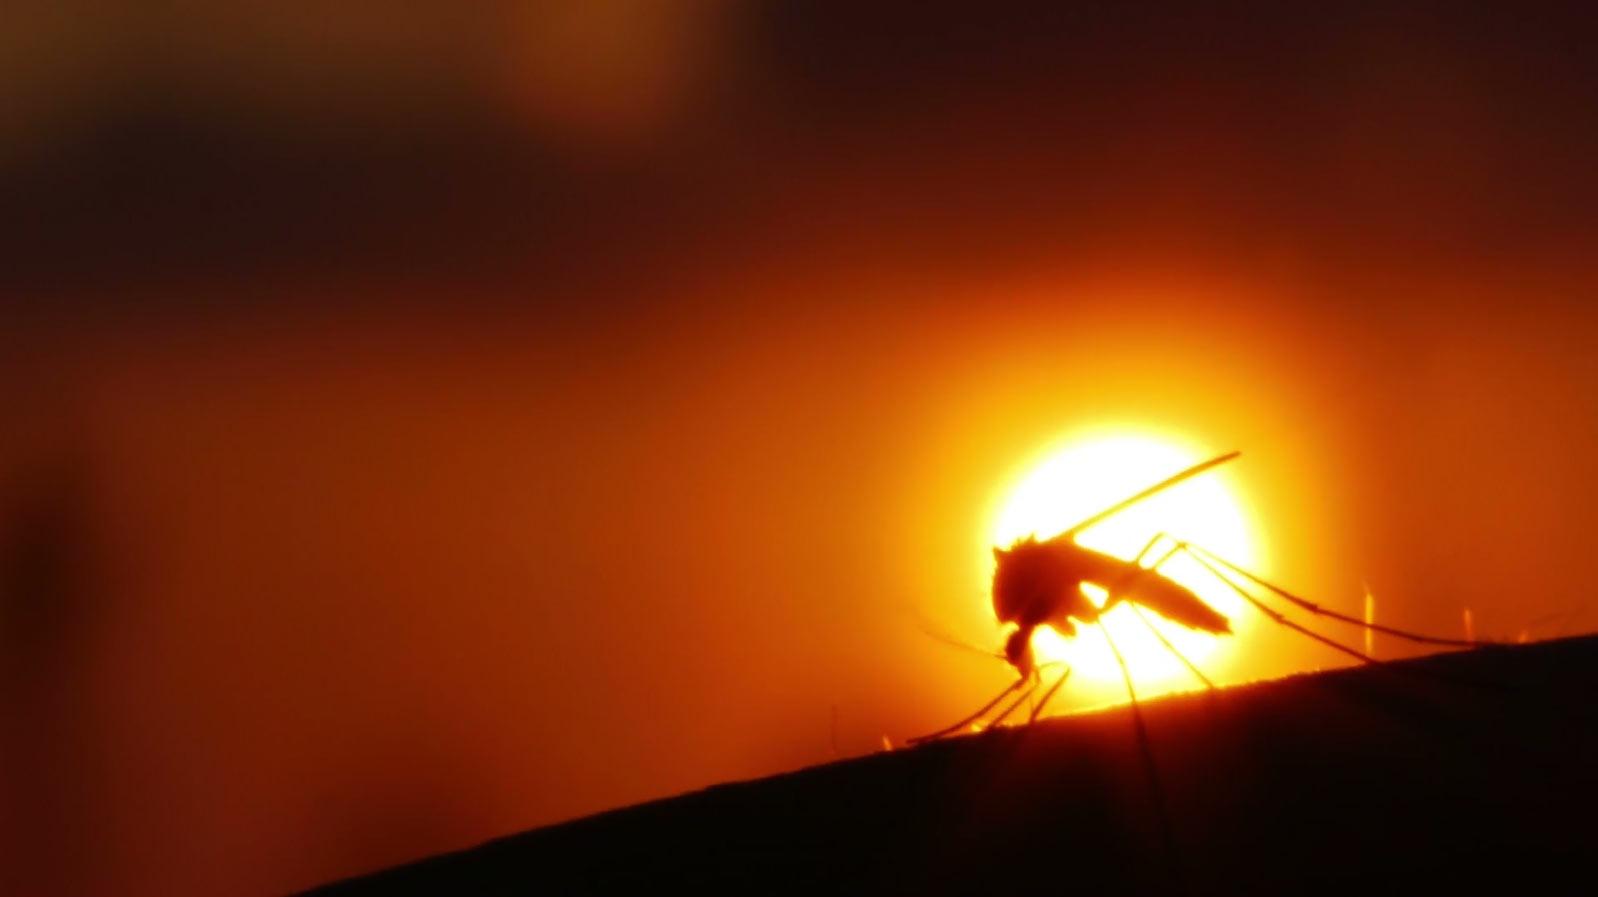 University of Miami - Special Report - Zika Virus